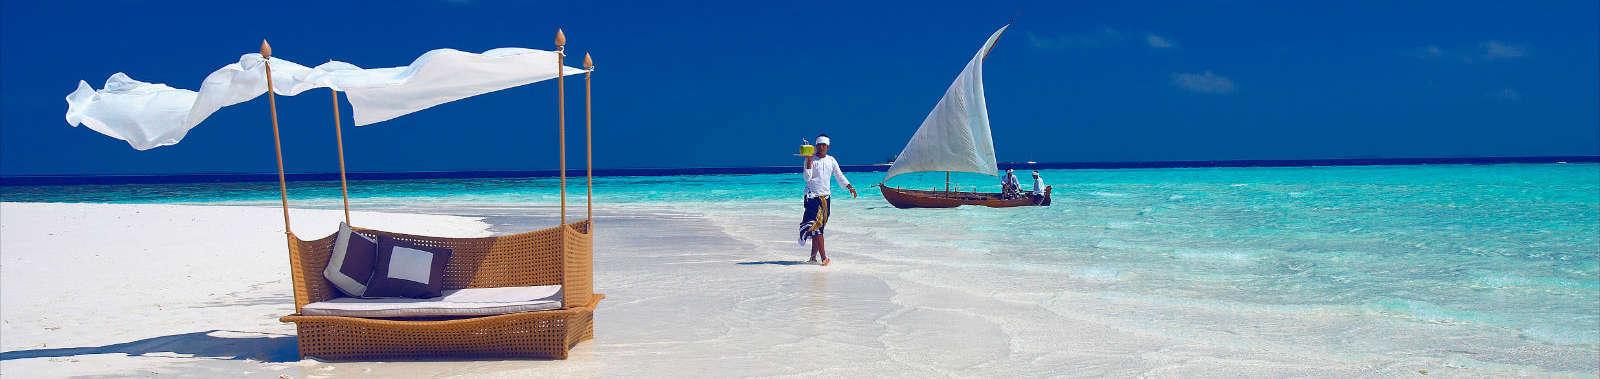 baros-maldives_sandbank-waiter_hr_1